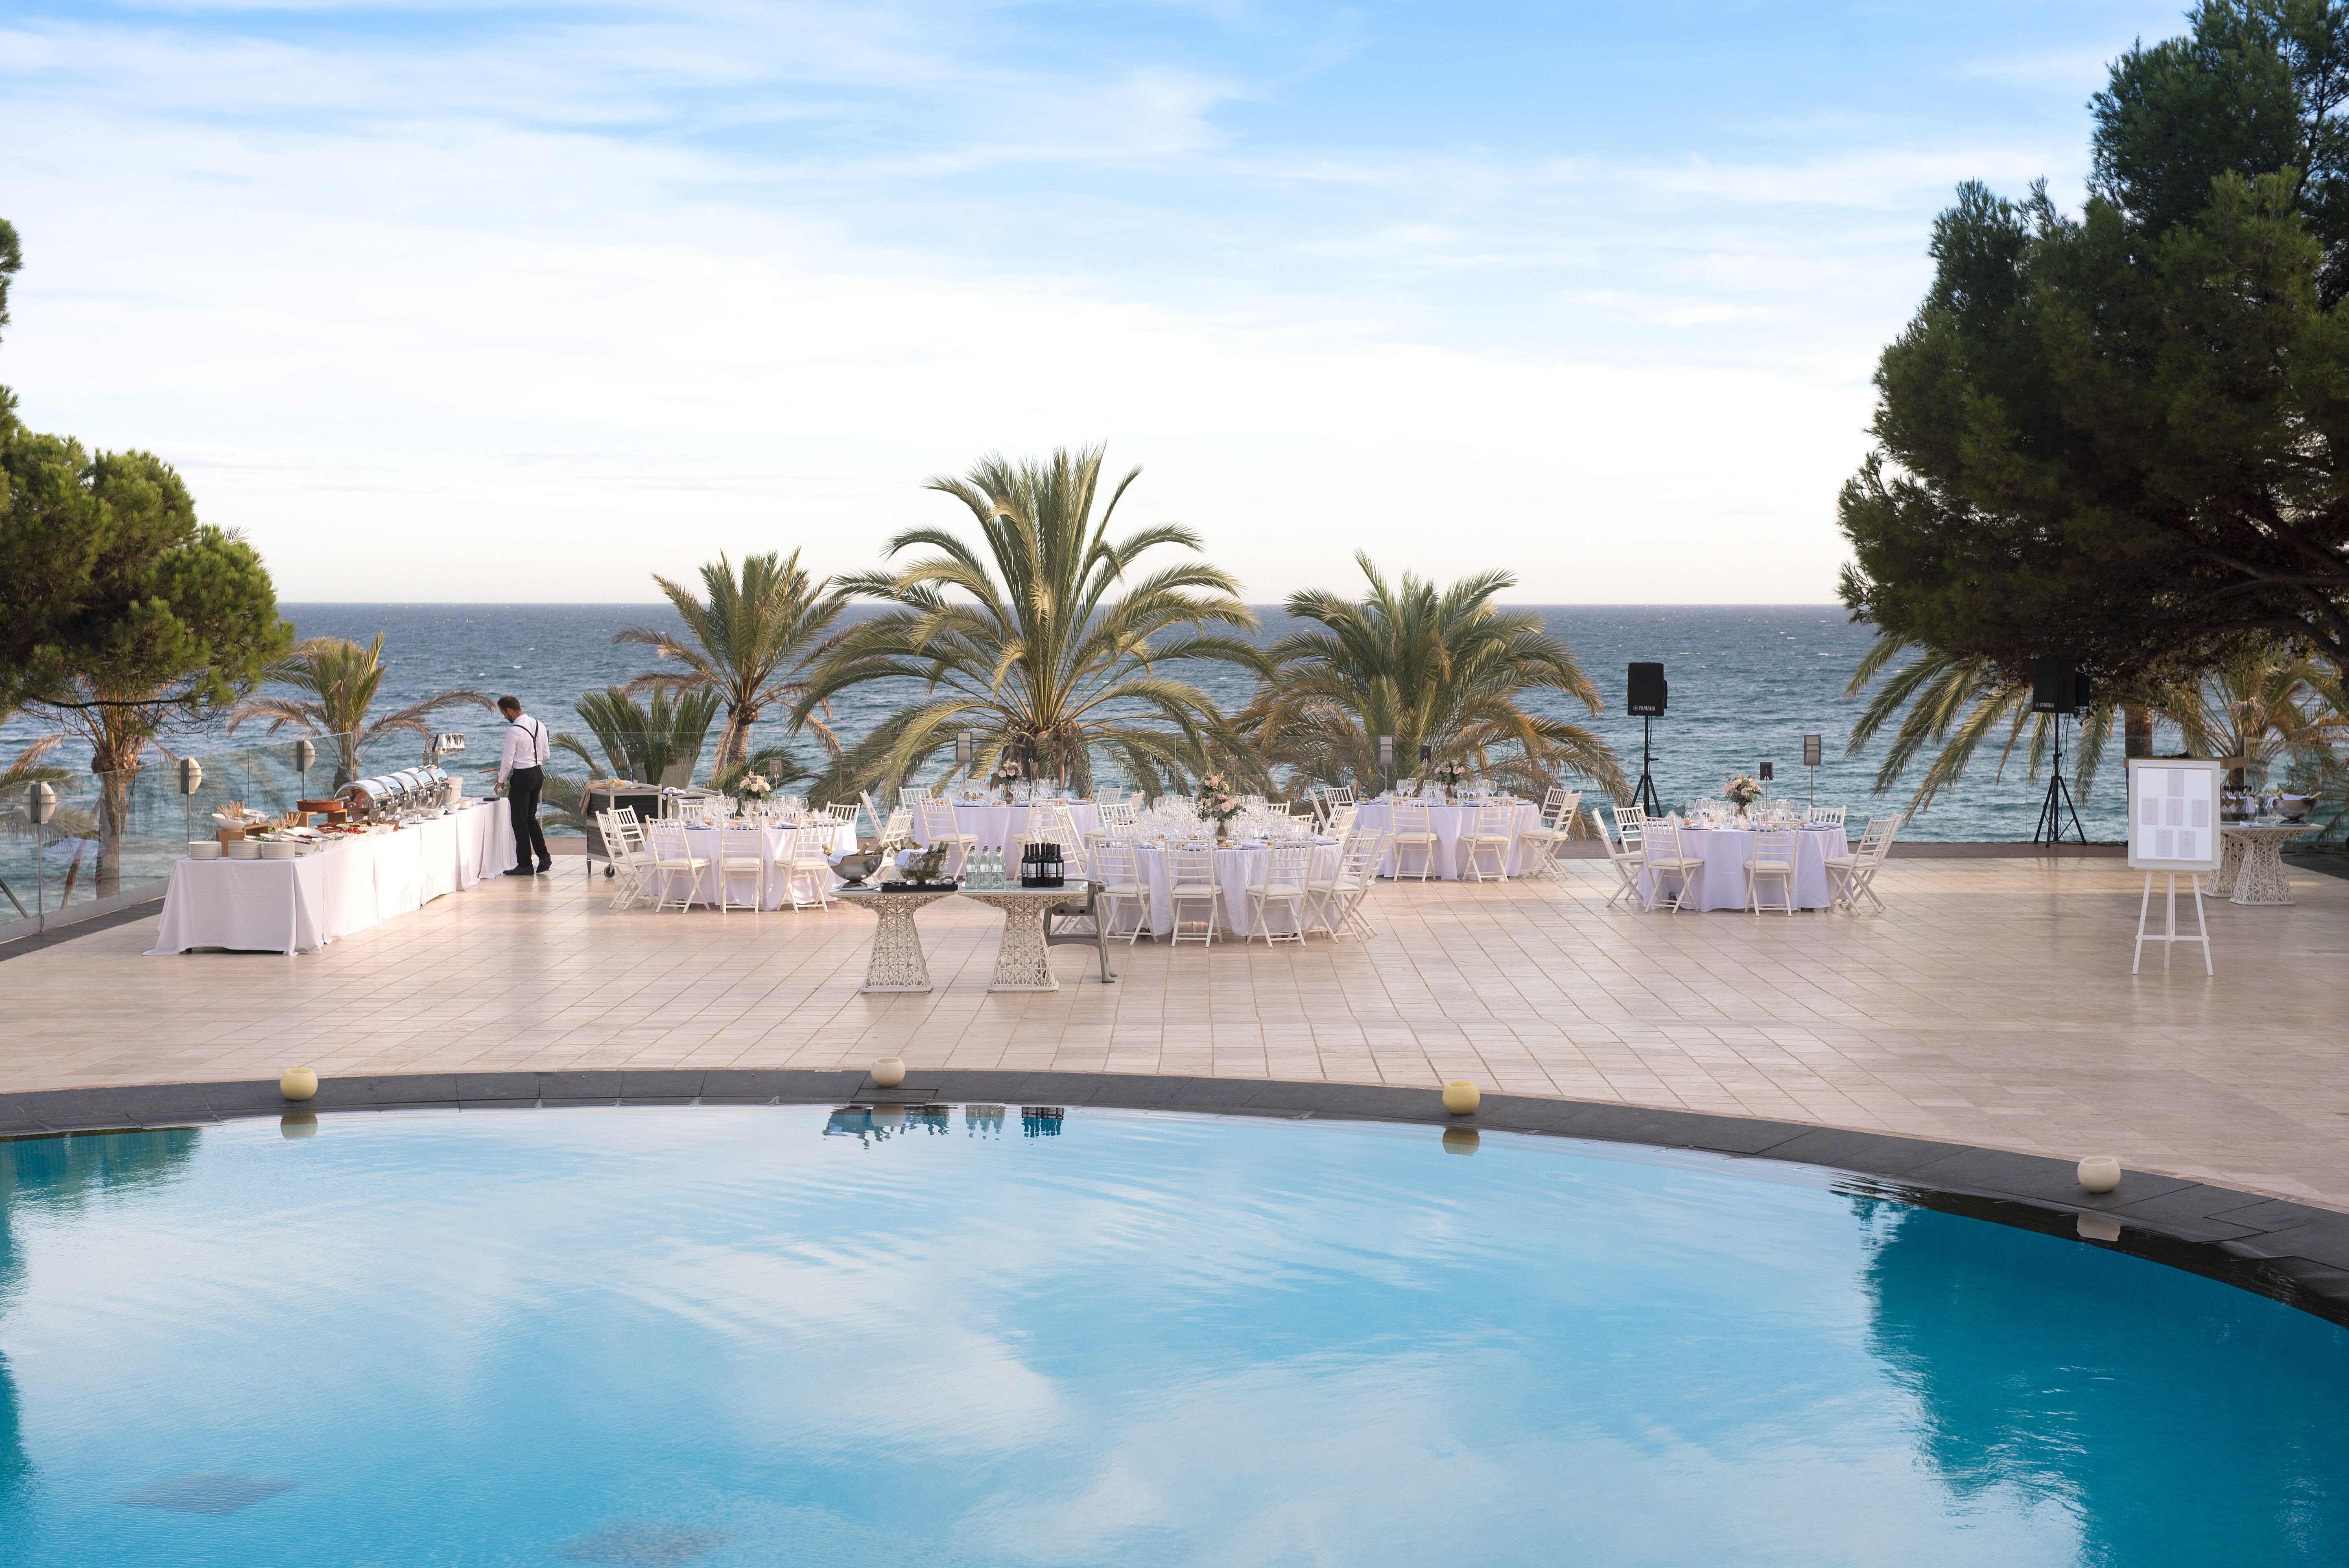 The stunning aquamarine pool